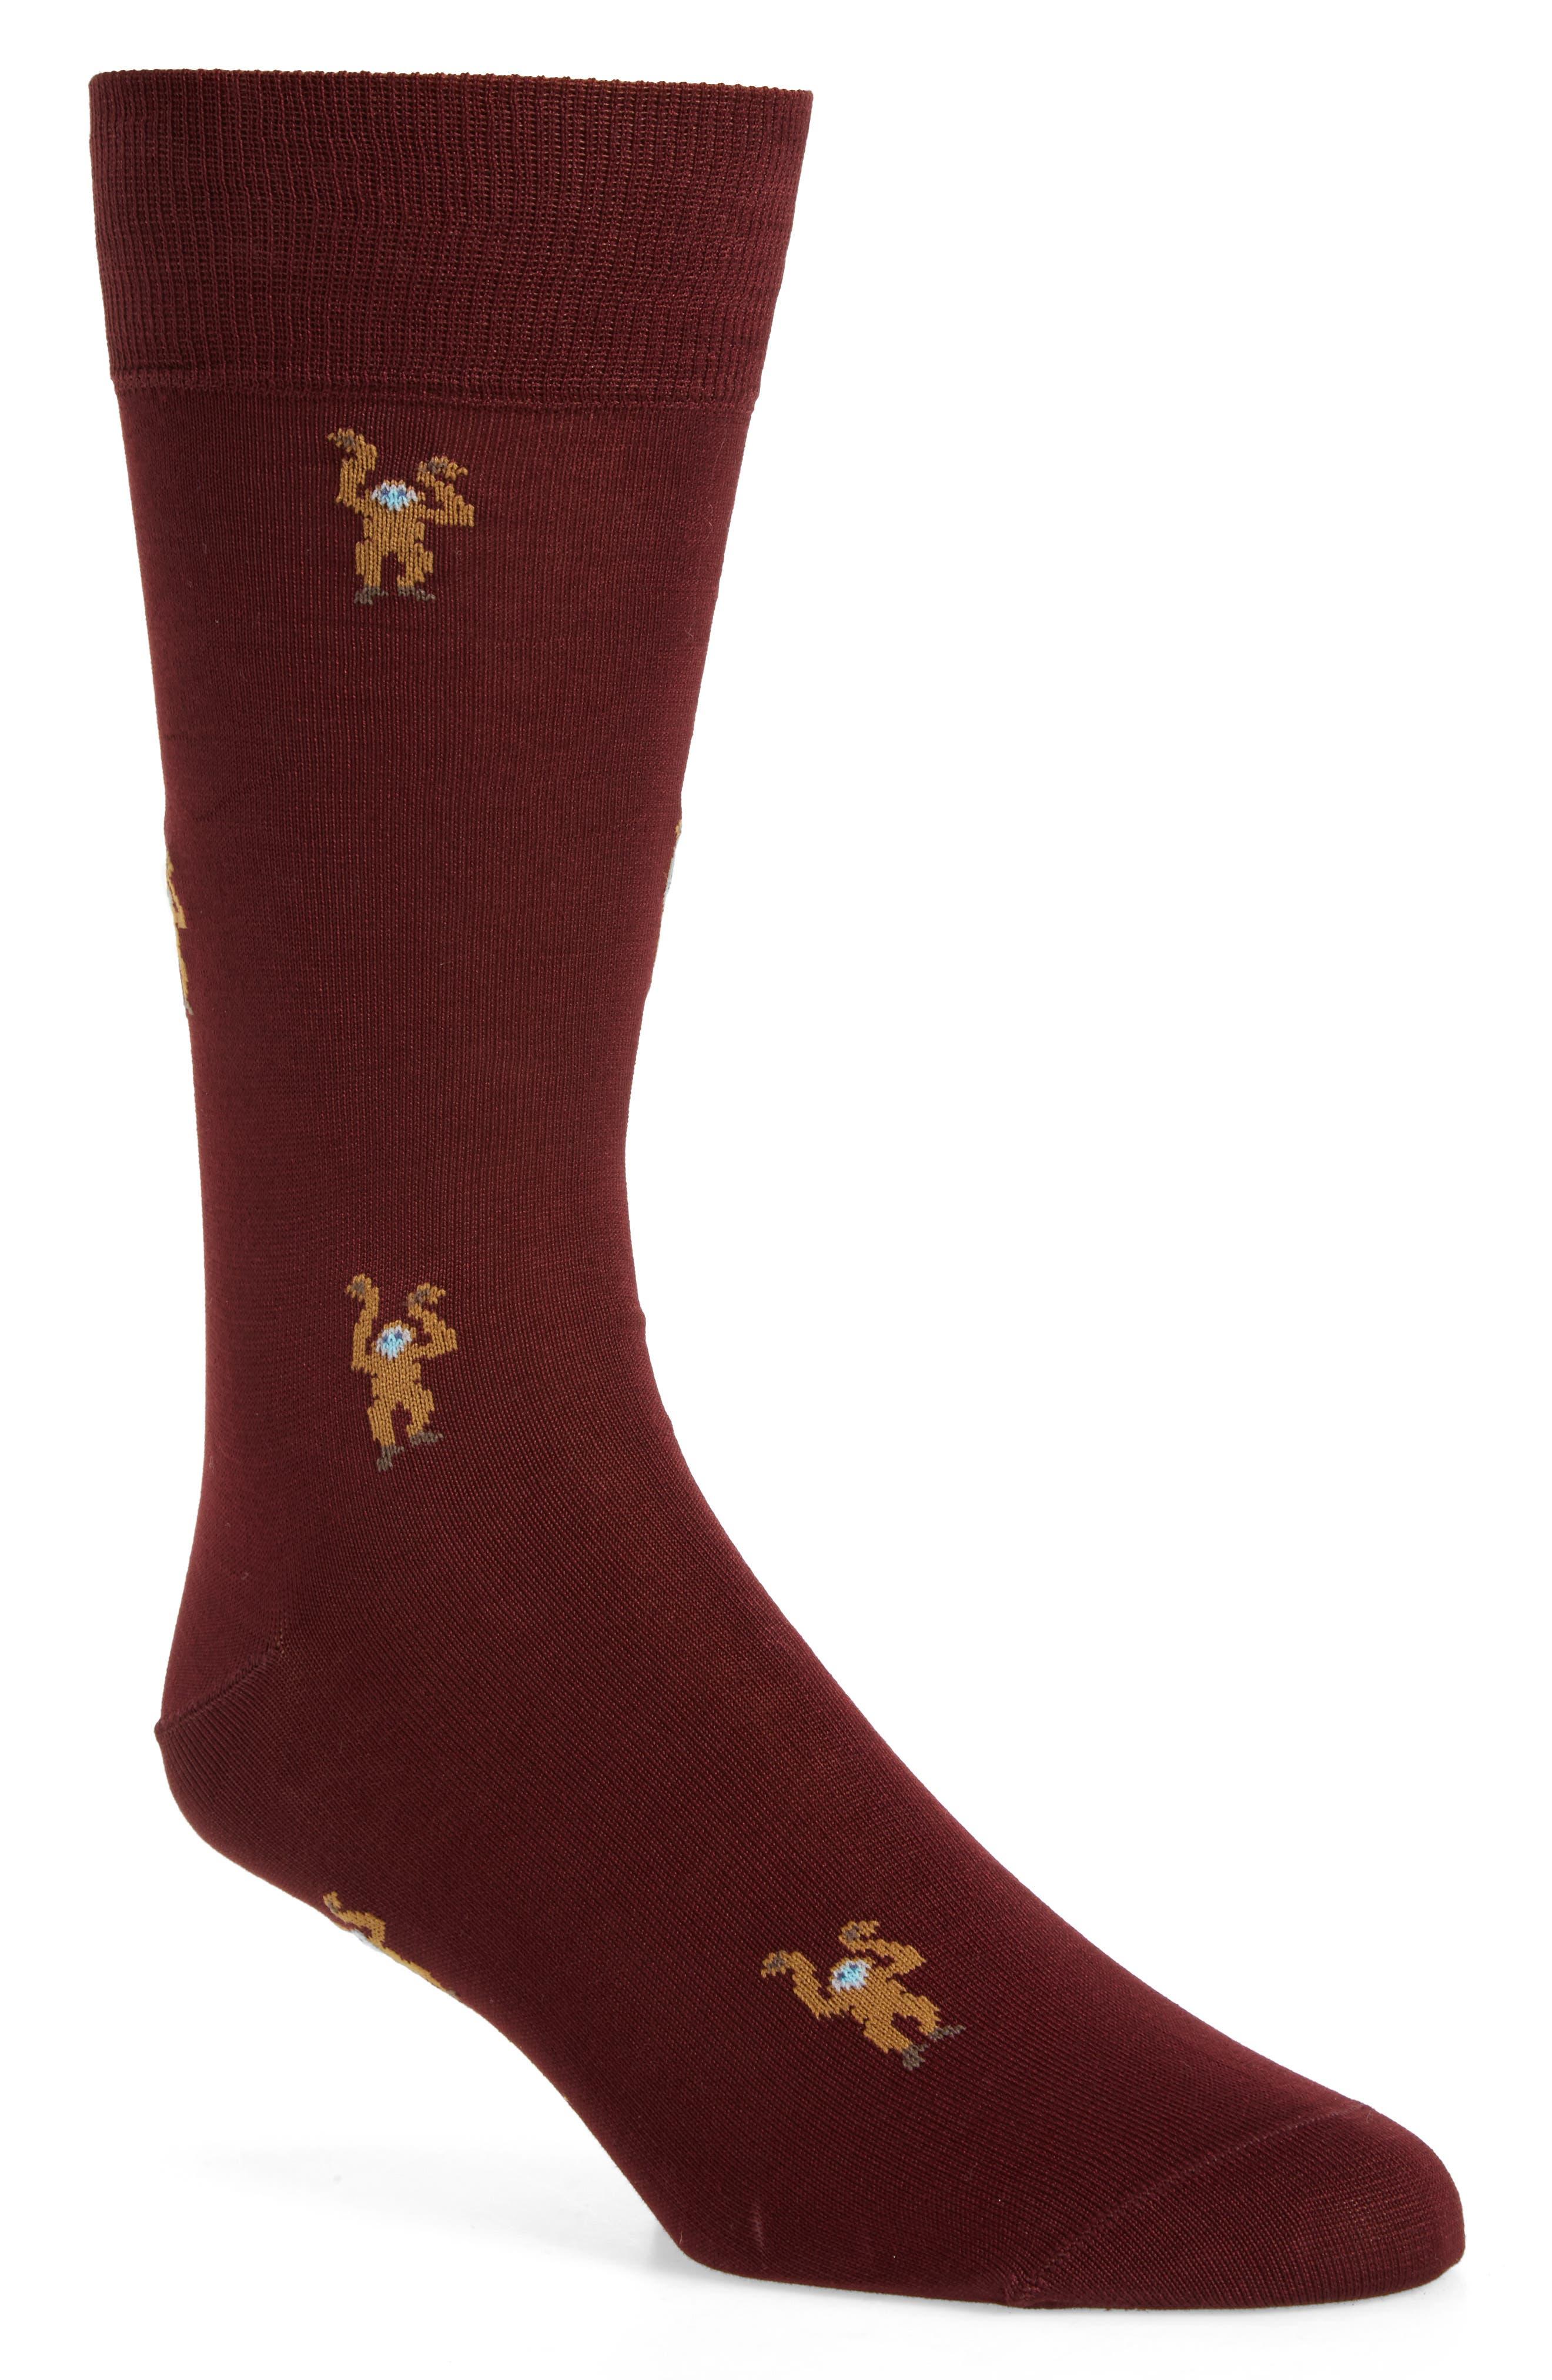 Monkey Socks,                             Main thumbnail 1, color,                             Burgundy